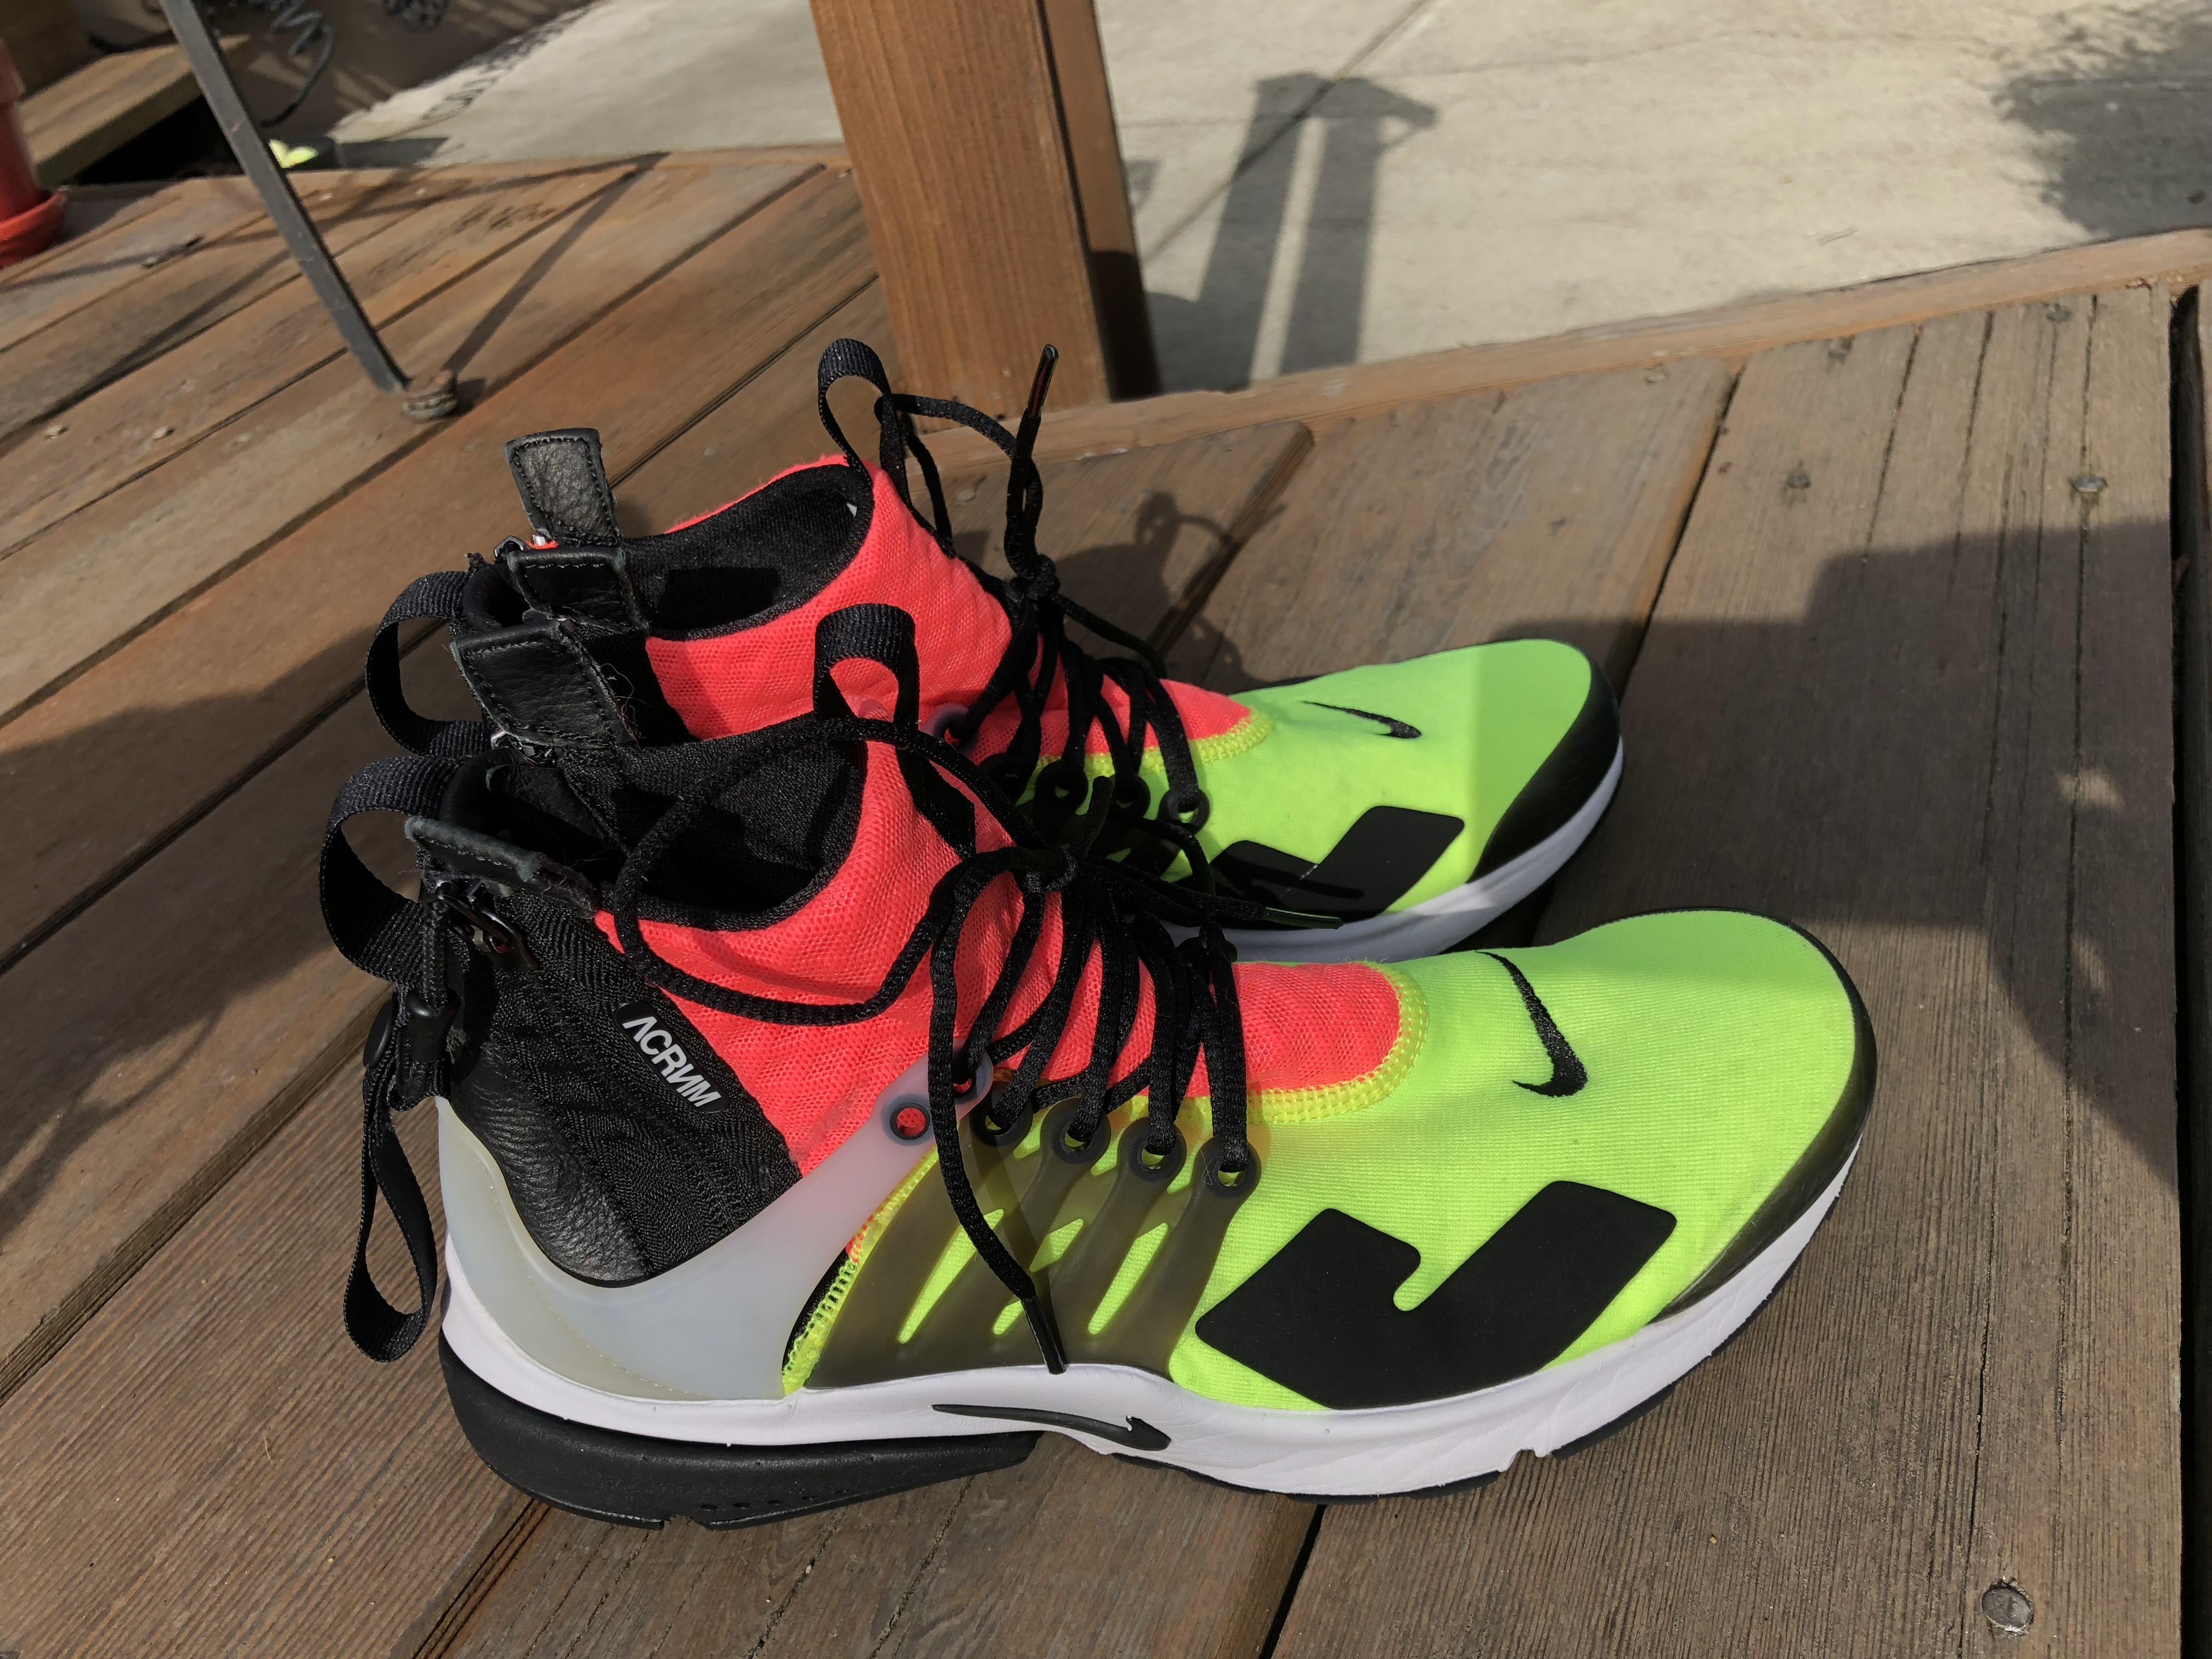 reputable site 9dd6b 83dc2 Acronym × Nike ACG ×. Nike ACG NIKE AIR PRESTO MID ACRONYM WHITE BLACK HOT  LAVA VOLT